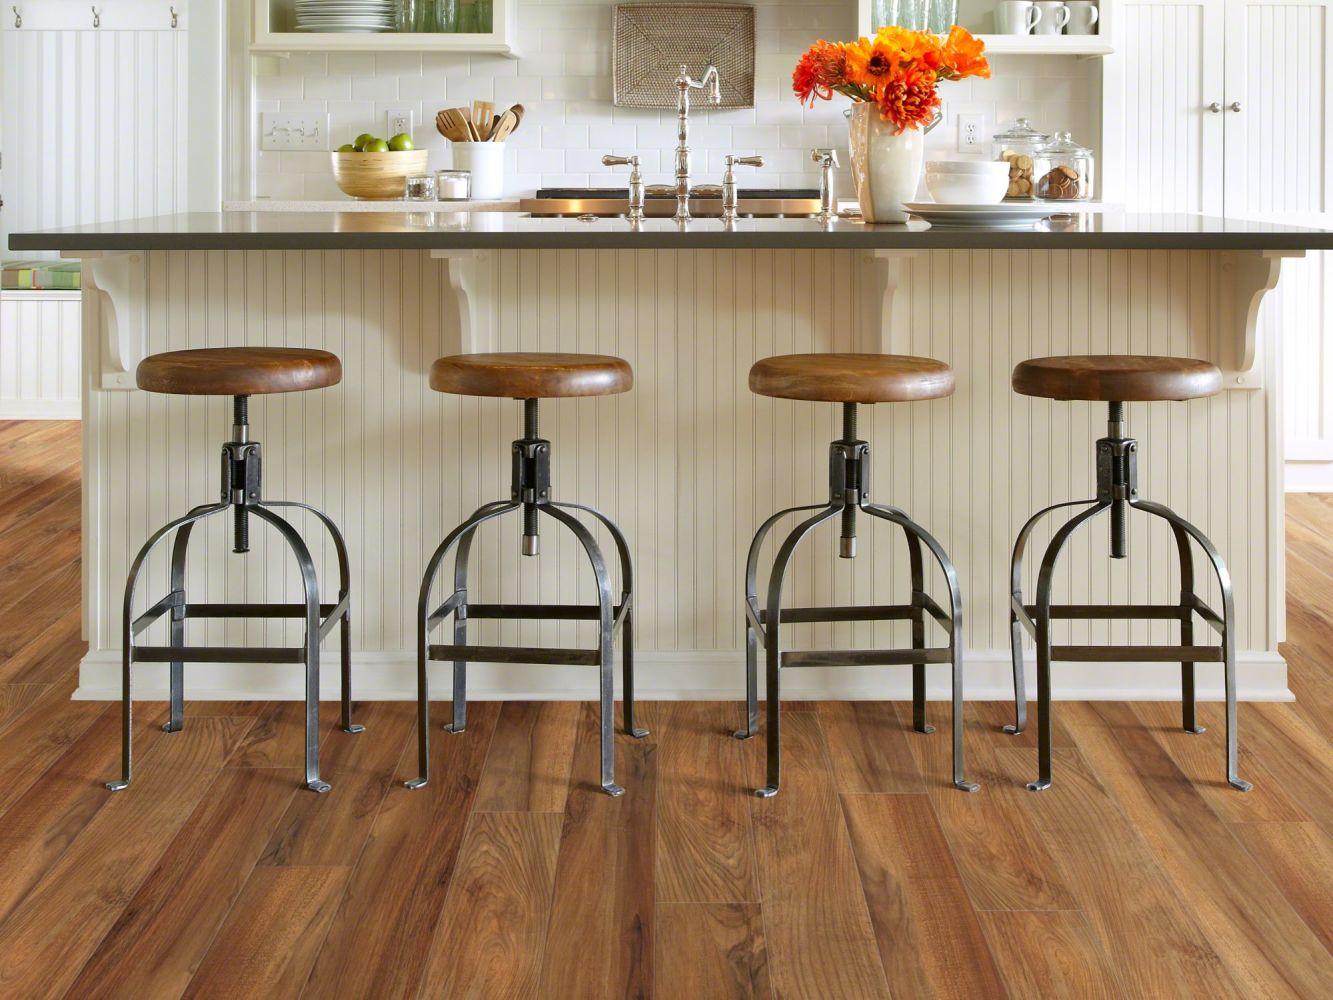 Shaw Floors Resilient Residential Islip Plus Venna 00820_HSS41